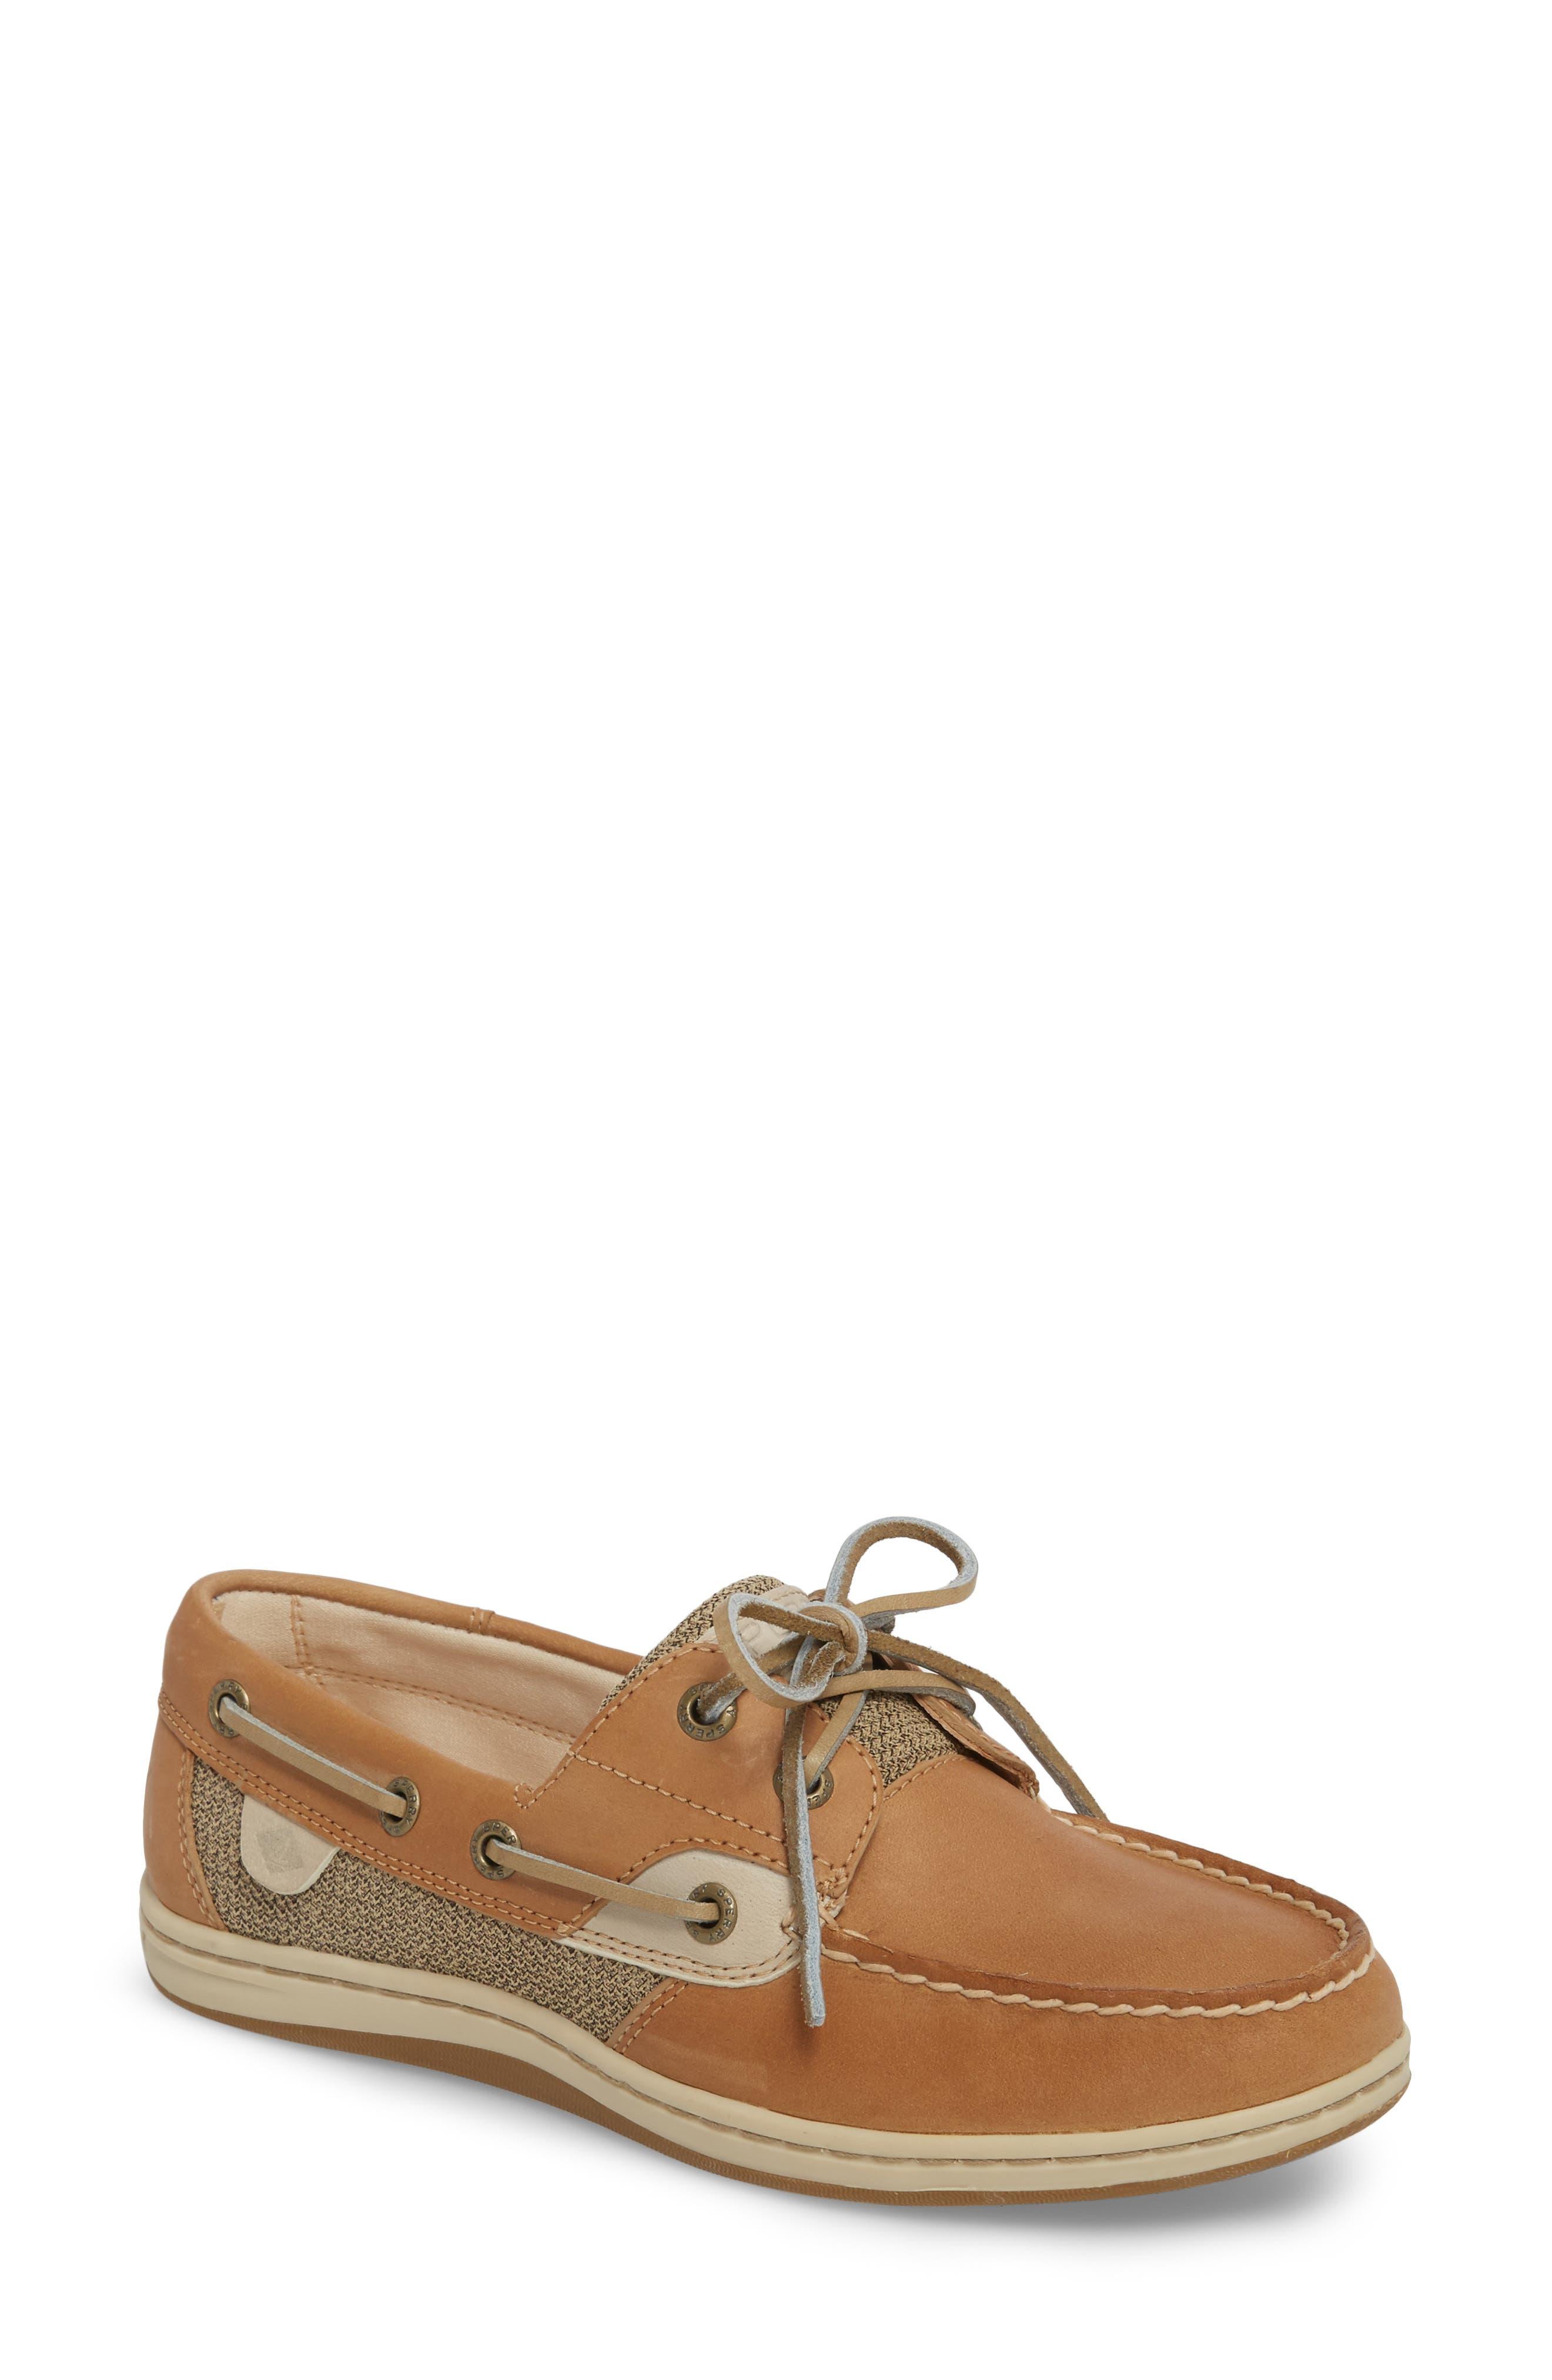 Top-Sider Koifish Loafer,                         Main,                         color, Linen Oat Leather